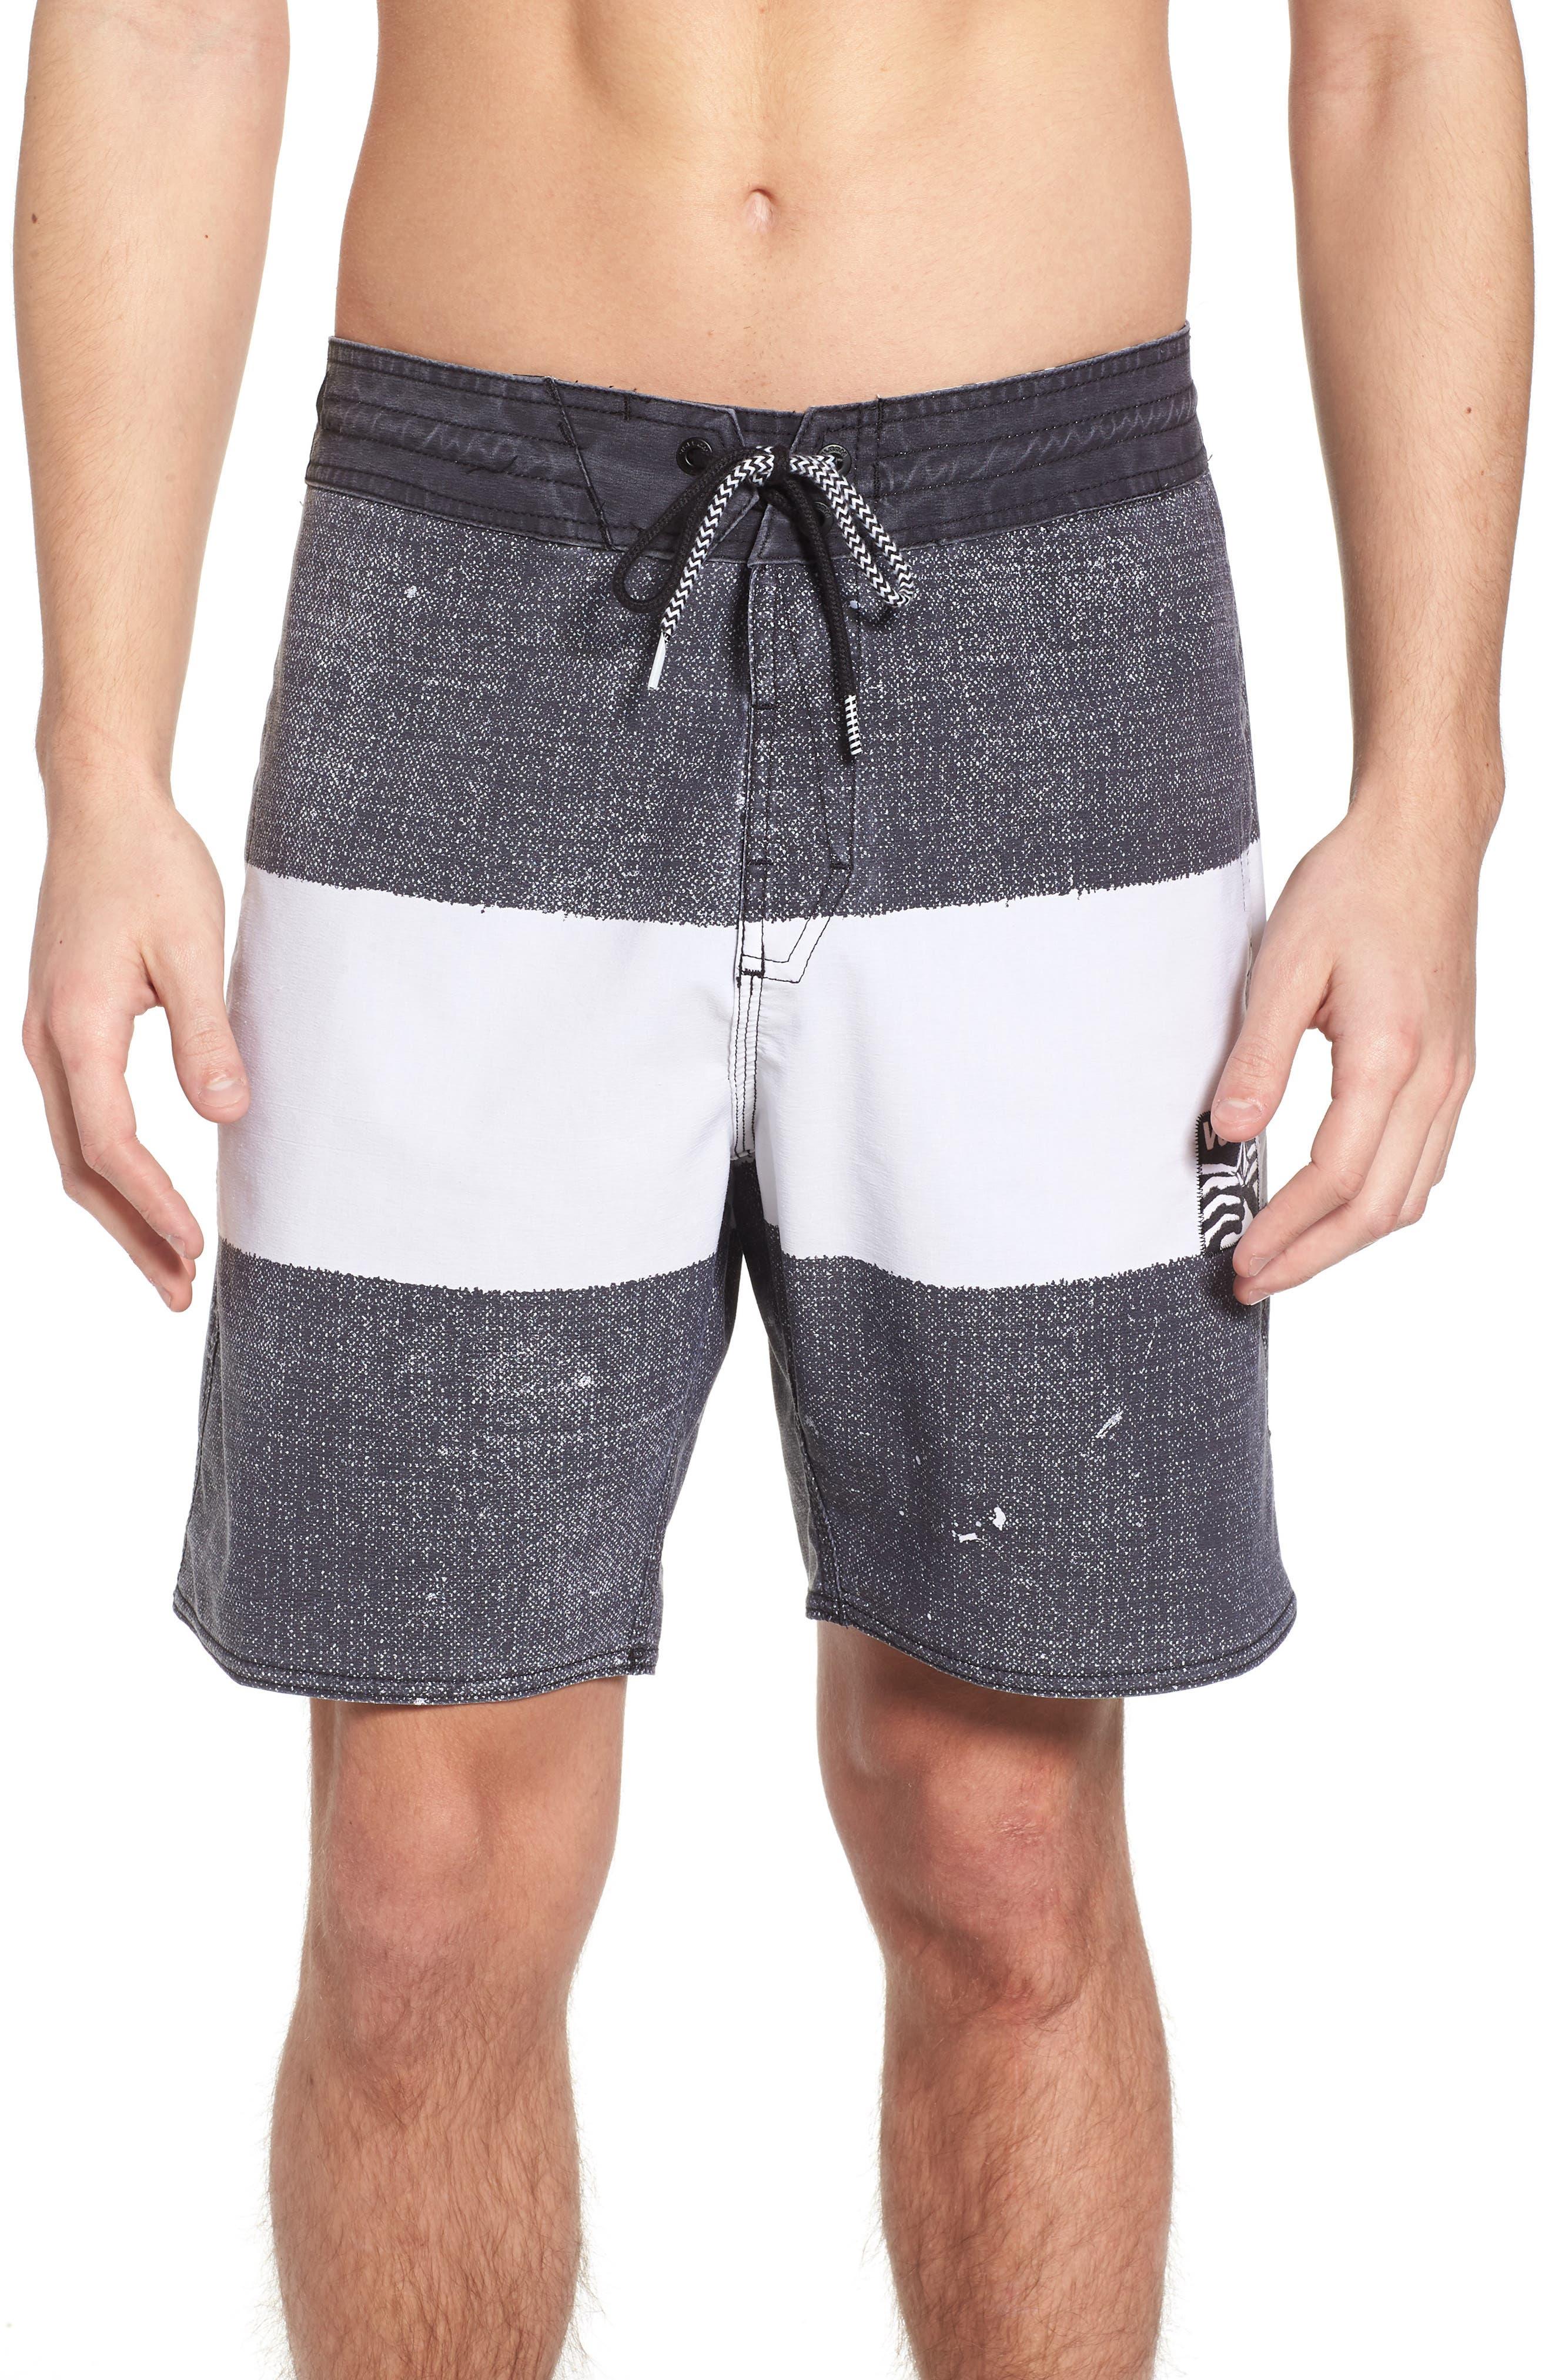 Balbroa Stoney Board Shorts,                         Main,                         color, Stealth